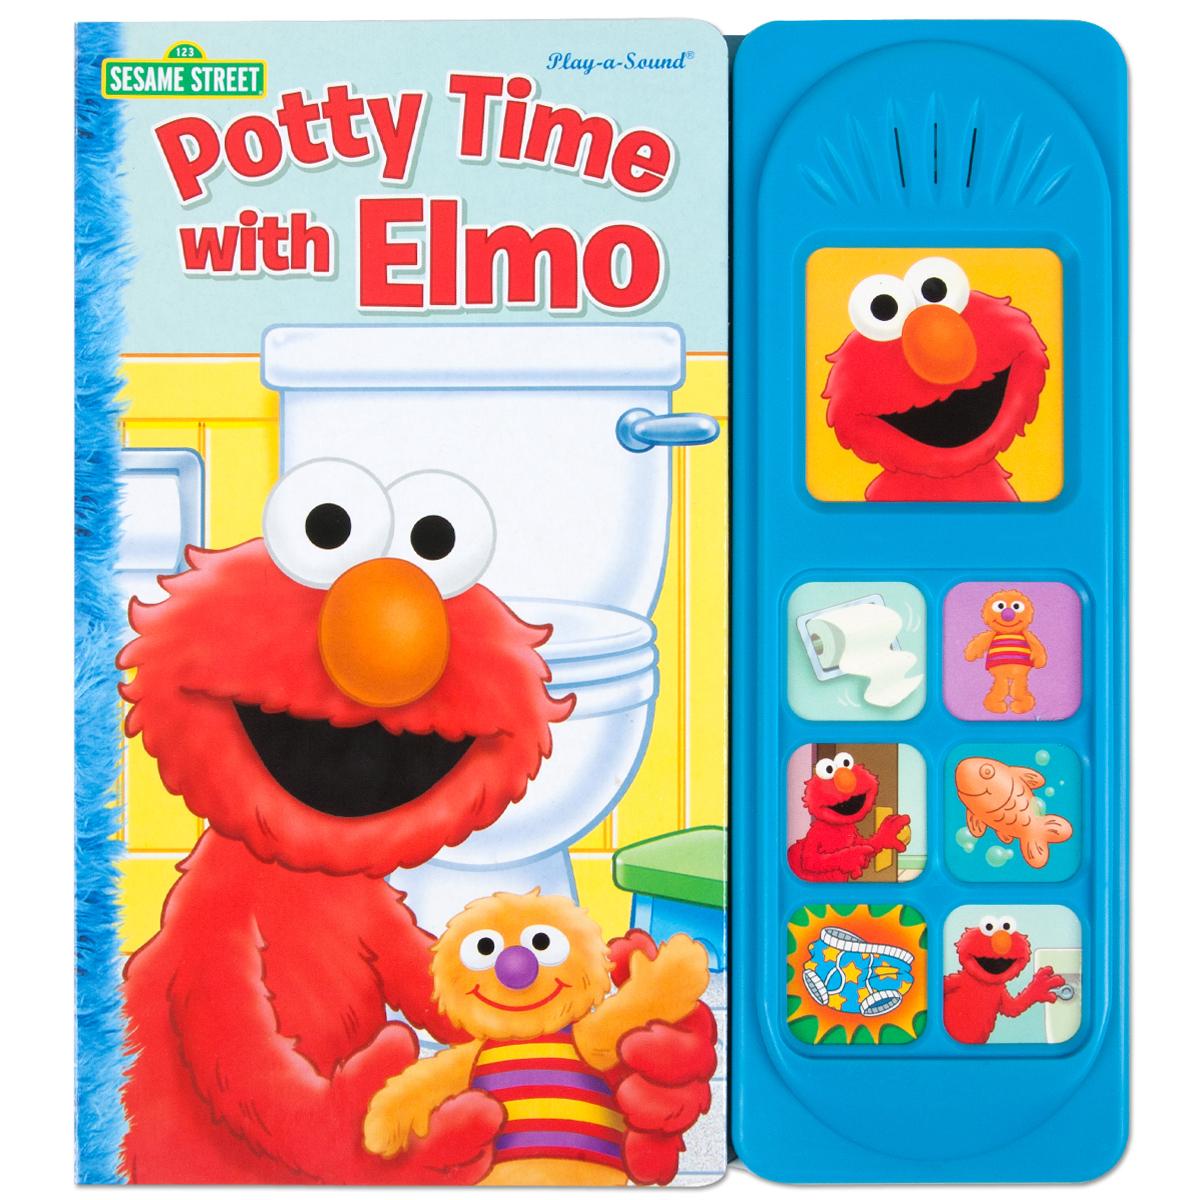 Potty Time with Elmo Sound Book